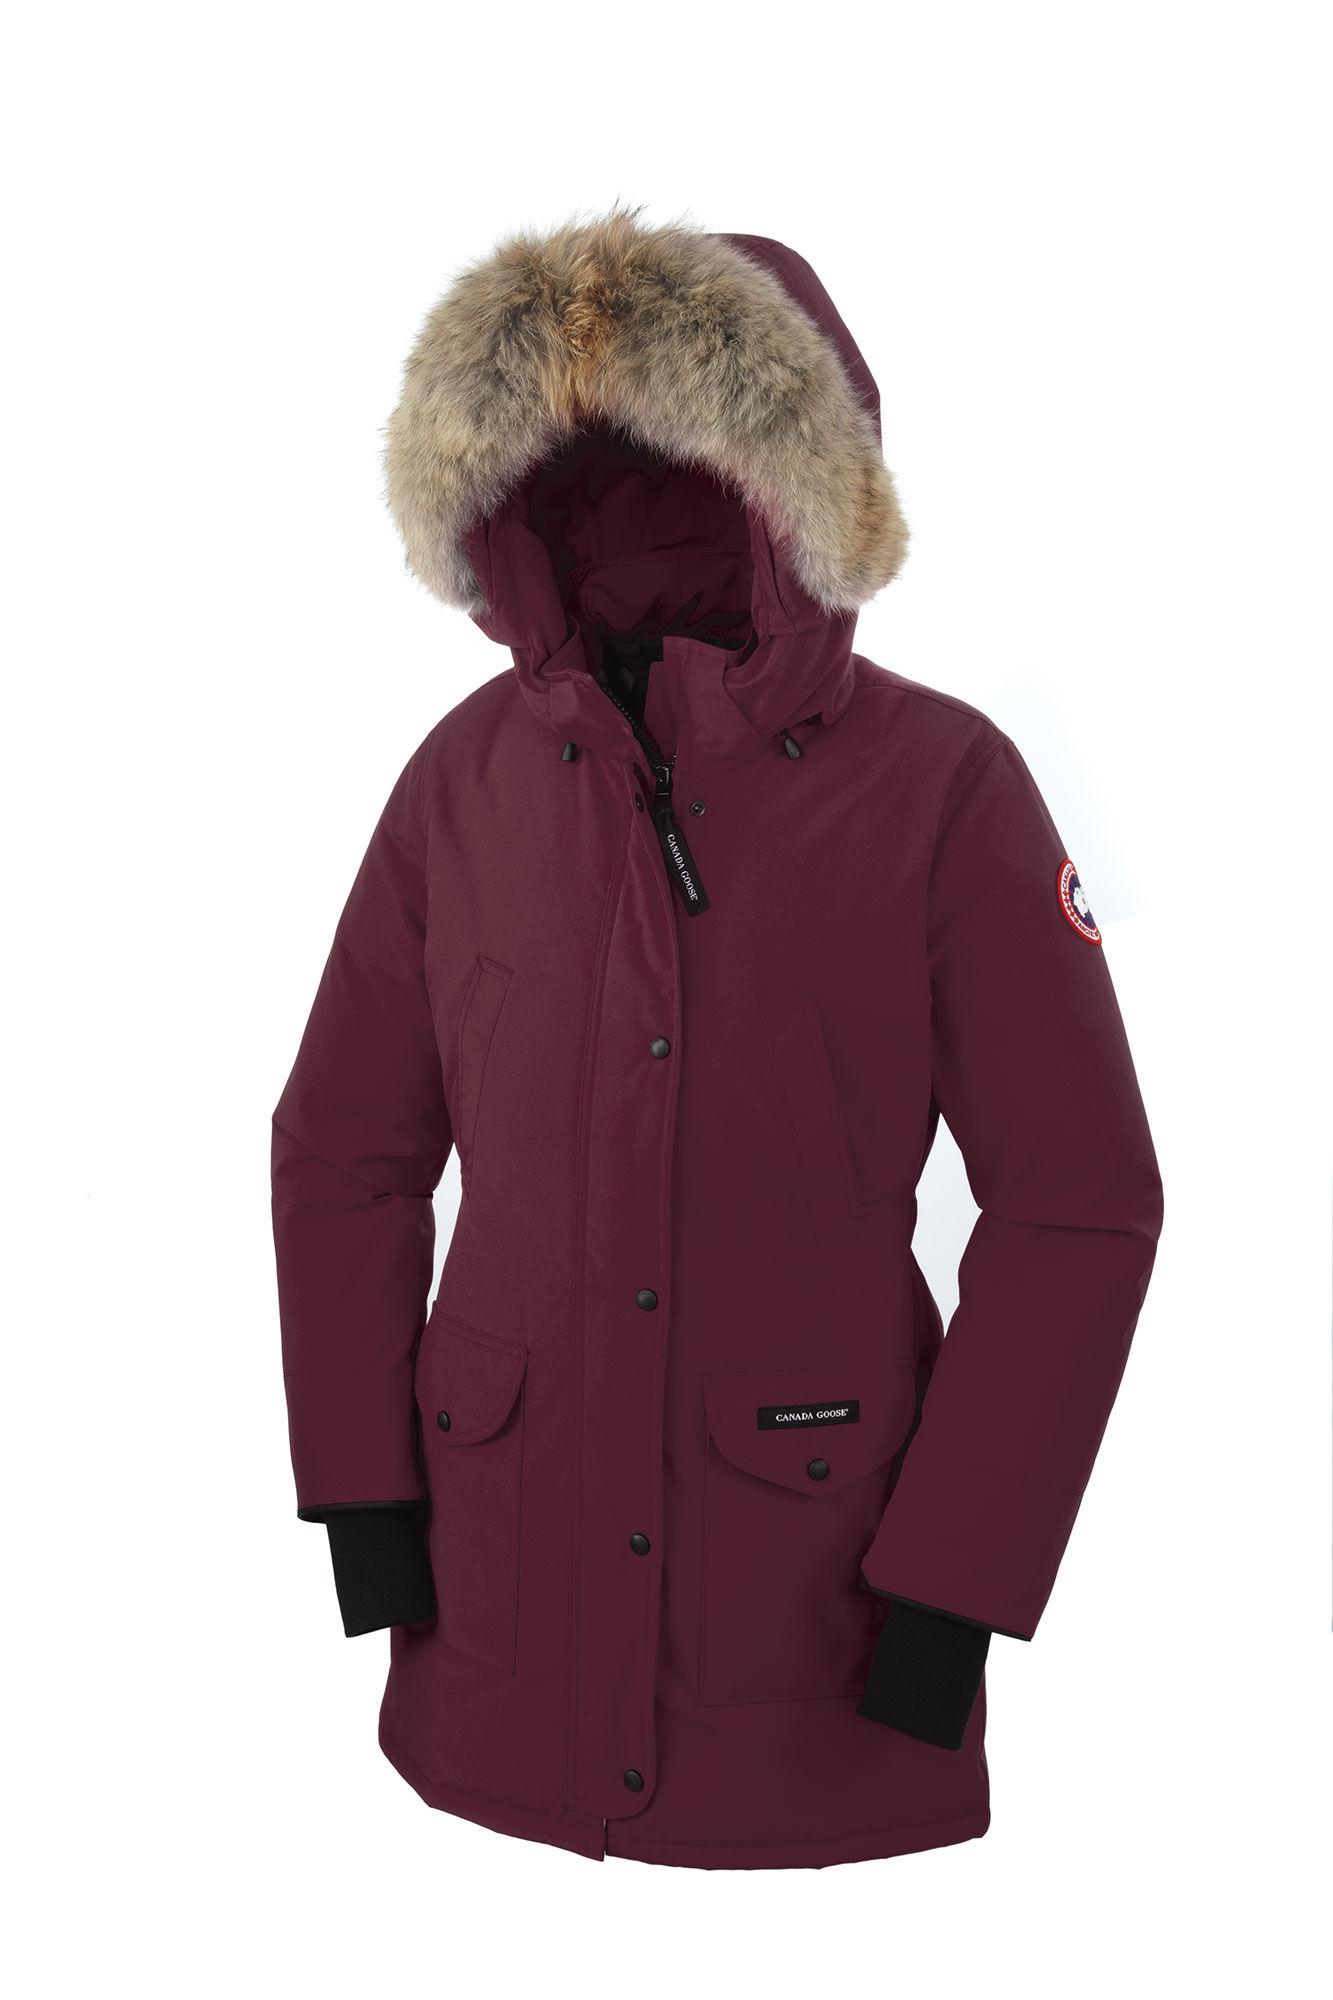 Canada Goose coats sale shop - Canada goose Trillium Parka in Red (Bordeaux) | Lyst